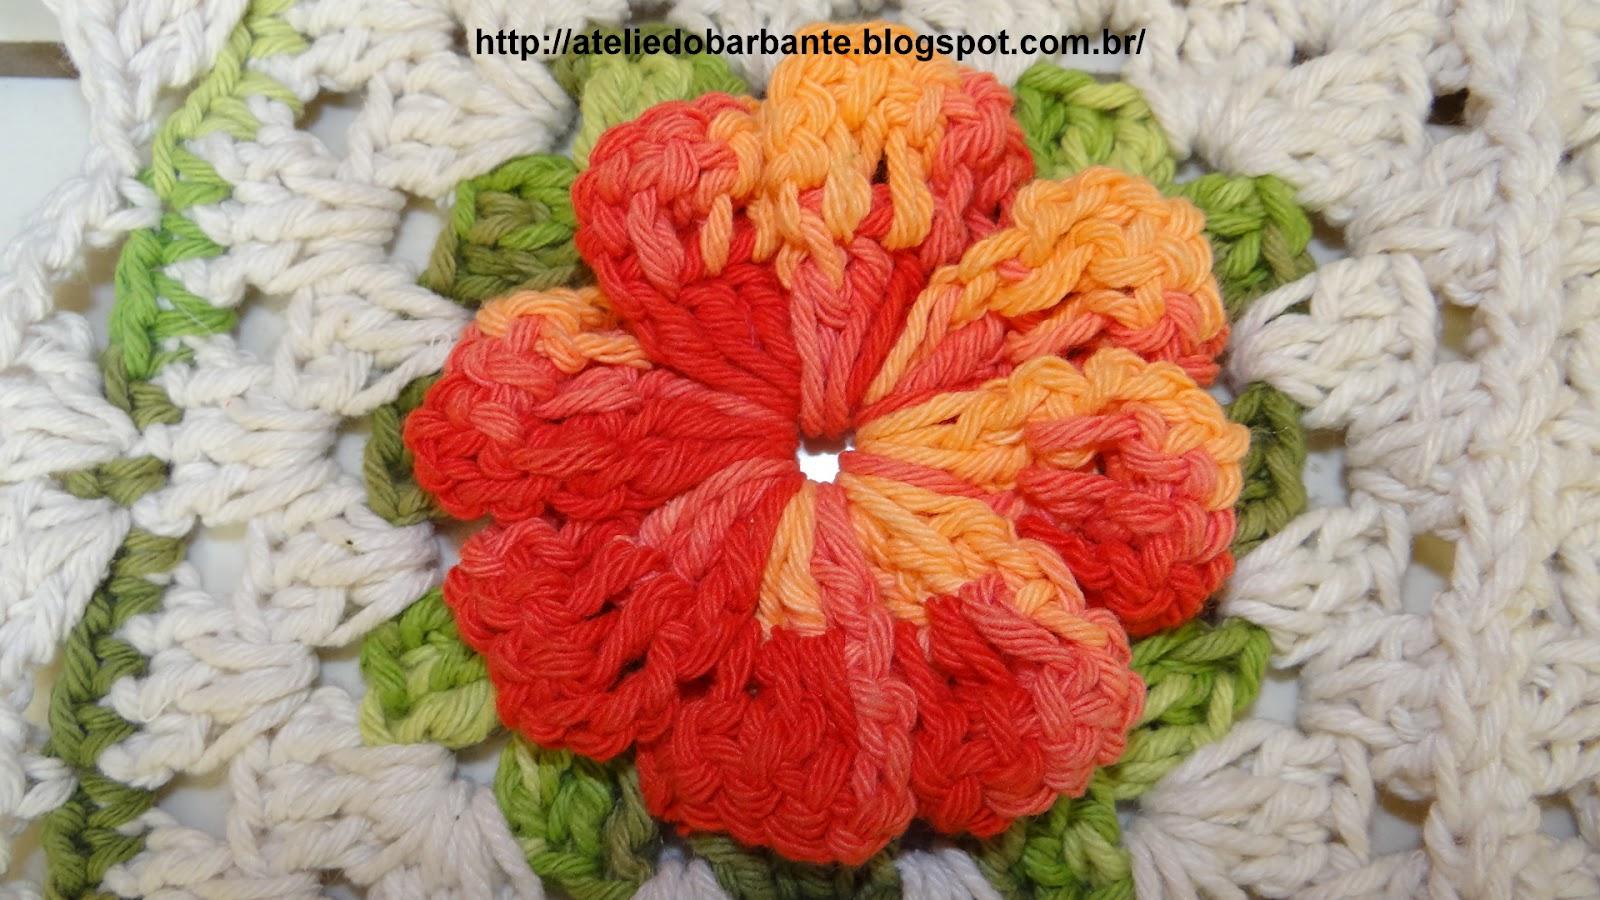 Ateliê do Barbante: Festival de Flores Barroco